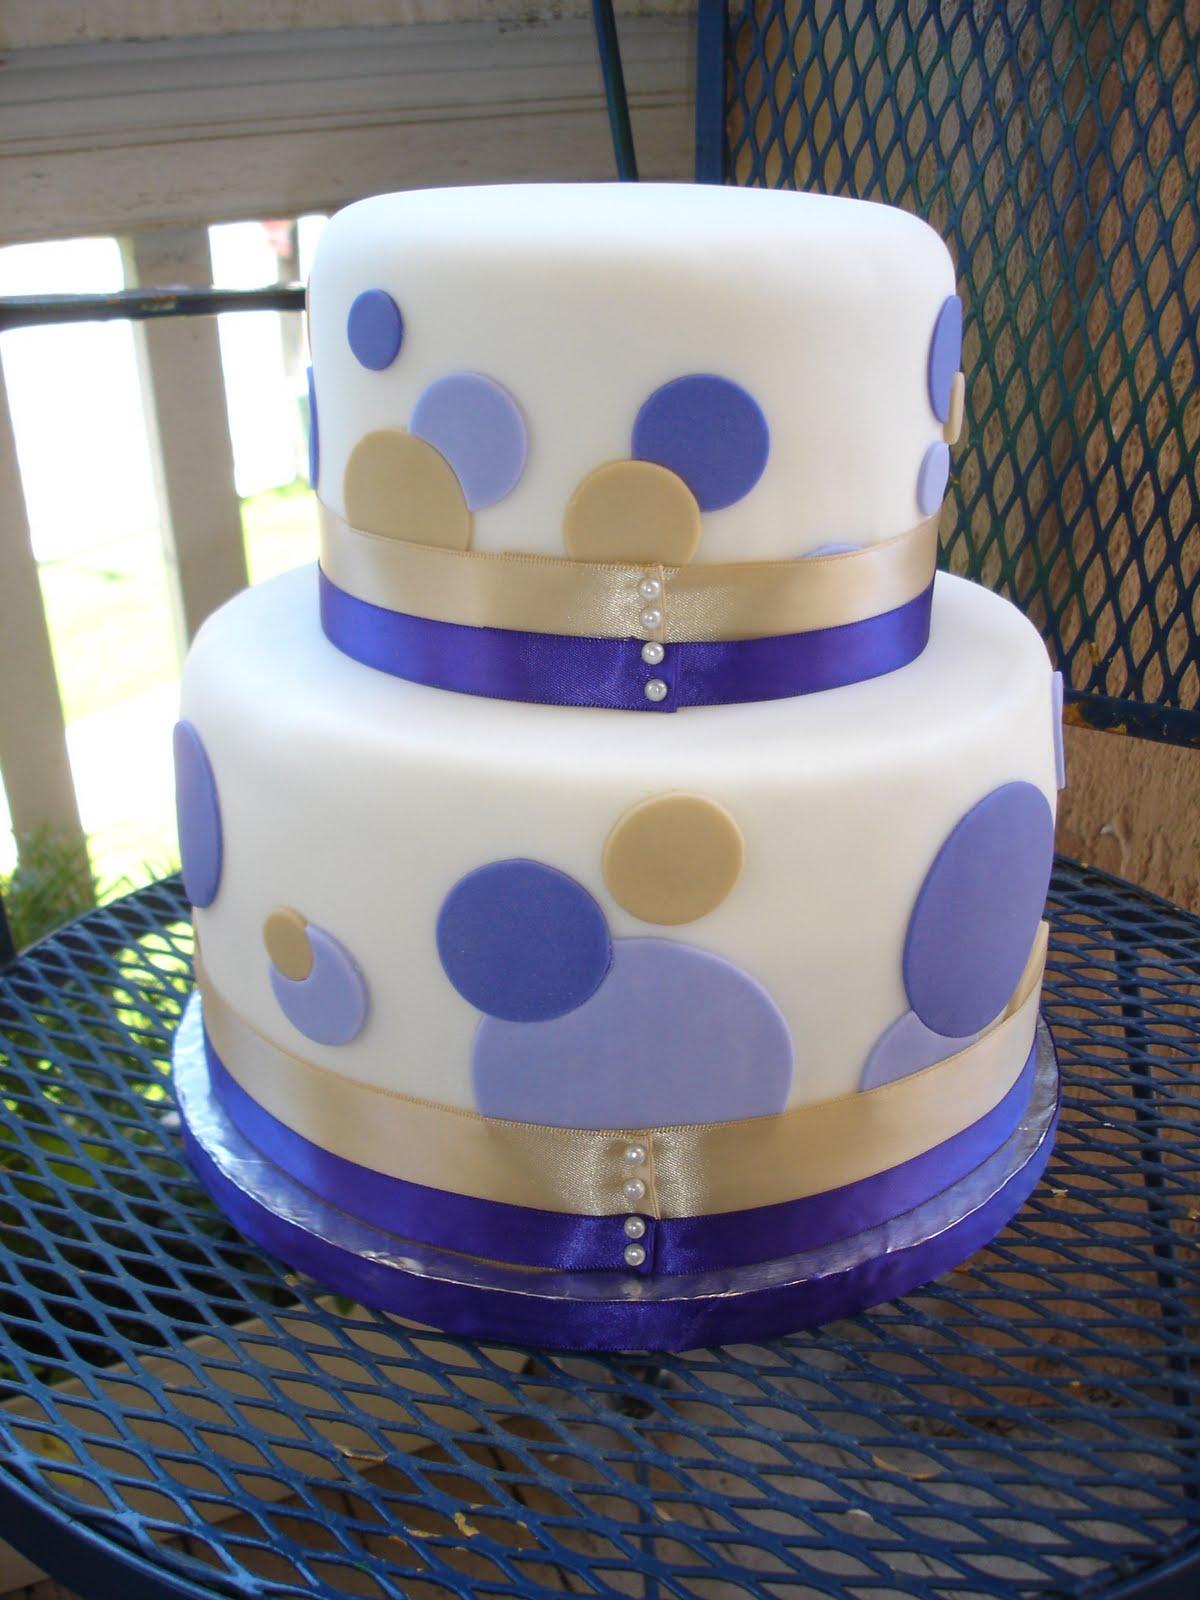 Cake As An Art A Polka Dot Wedding Cake